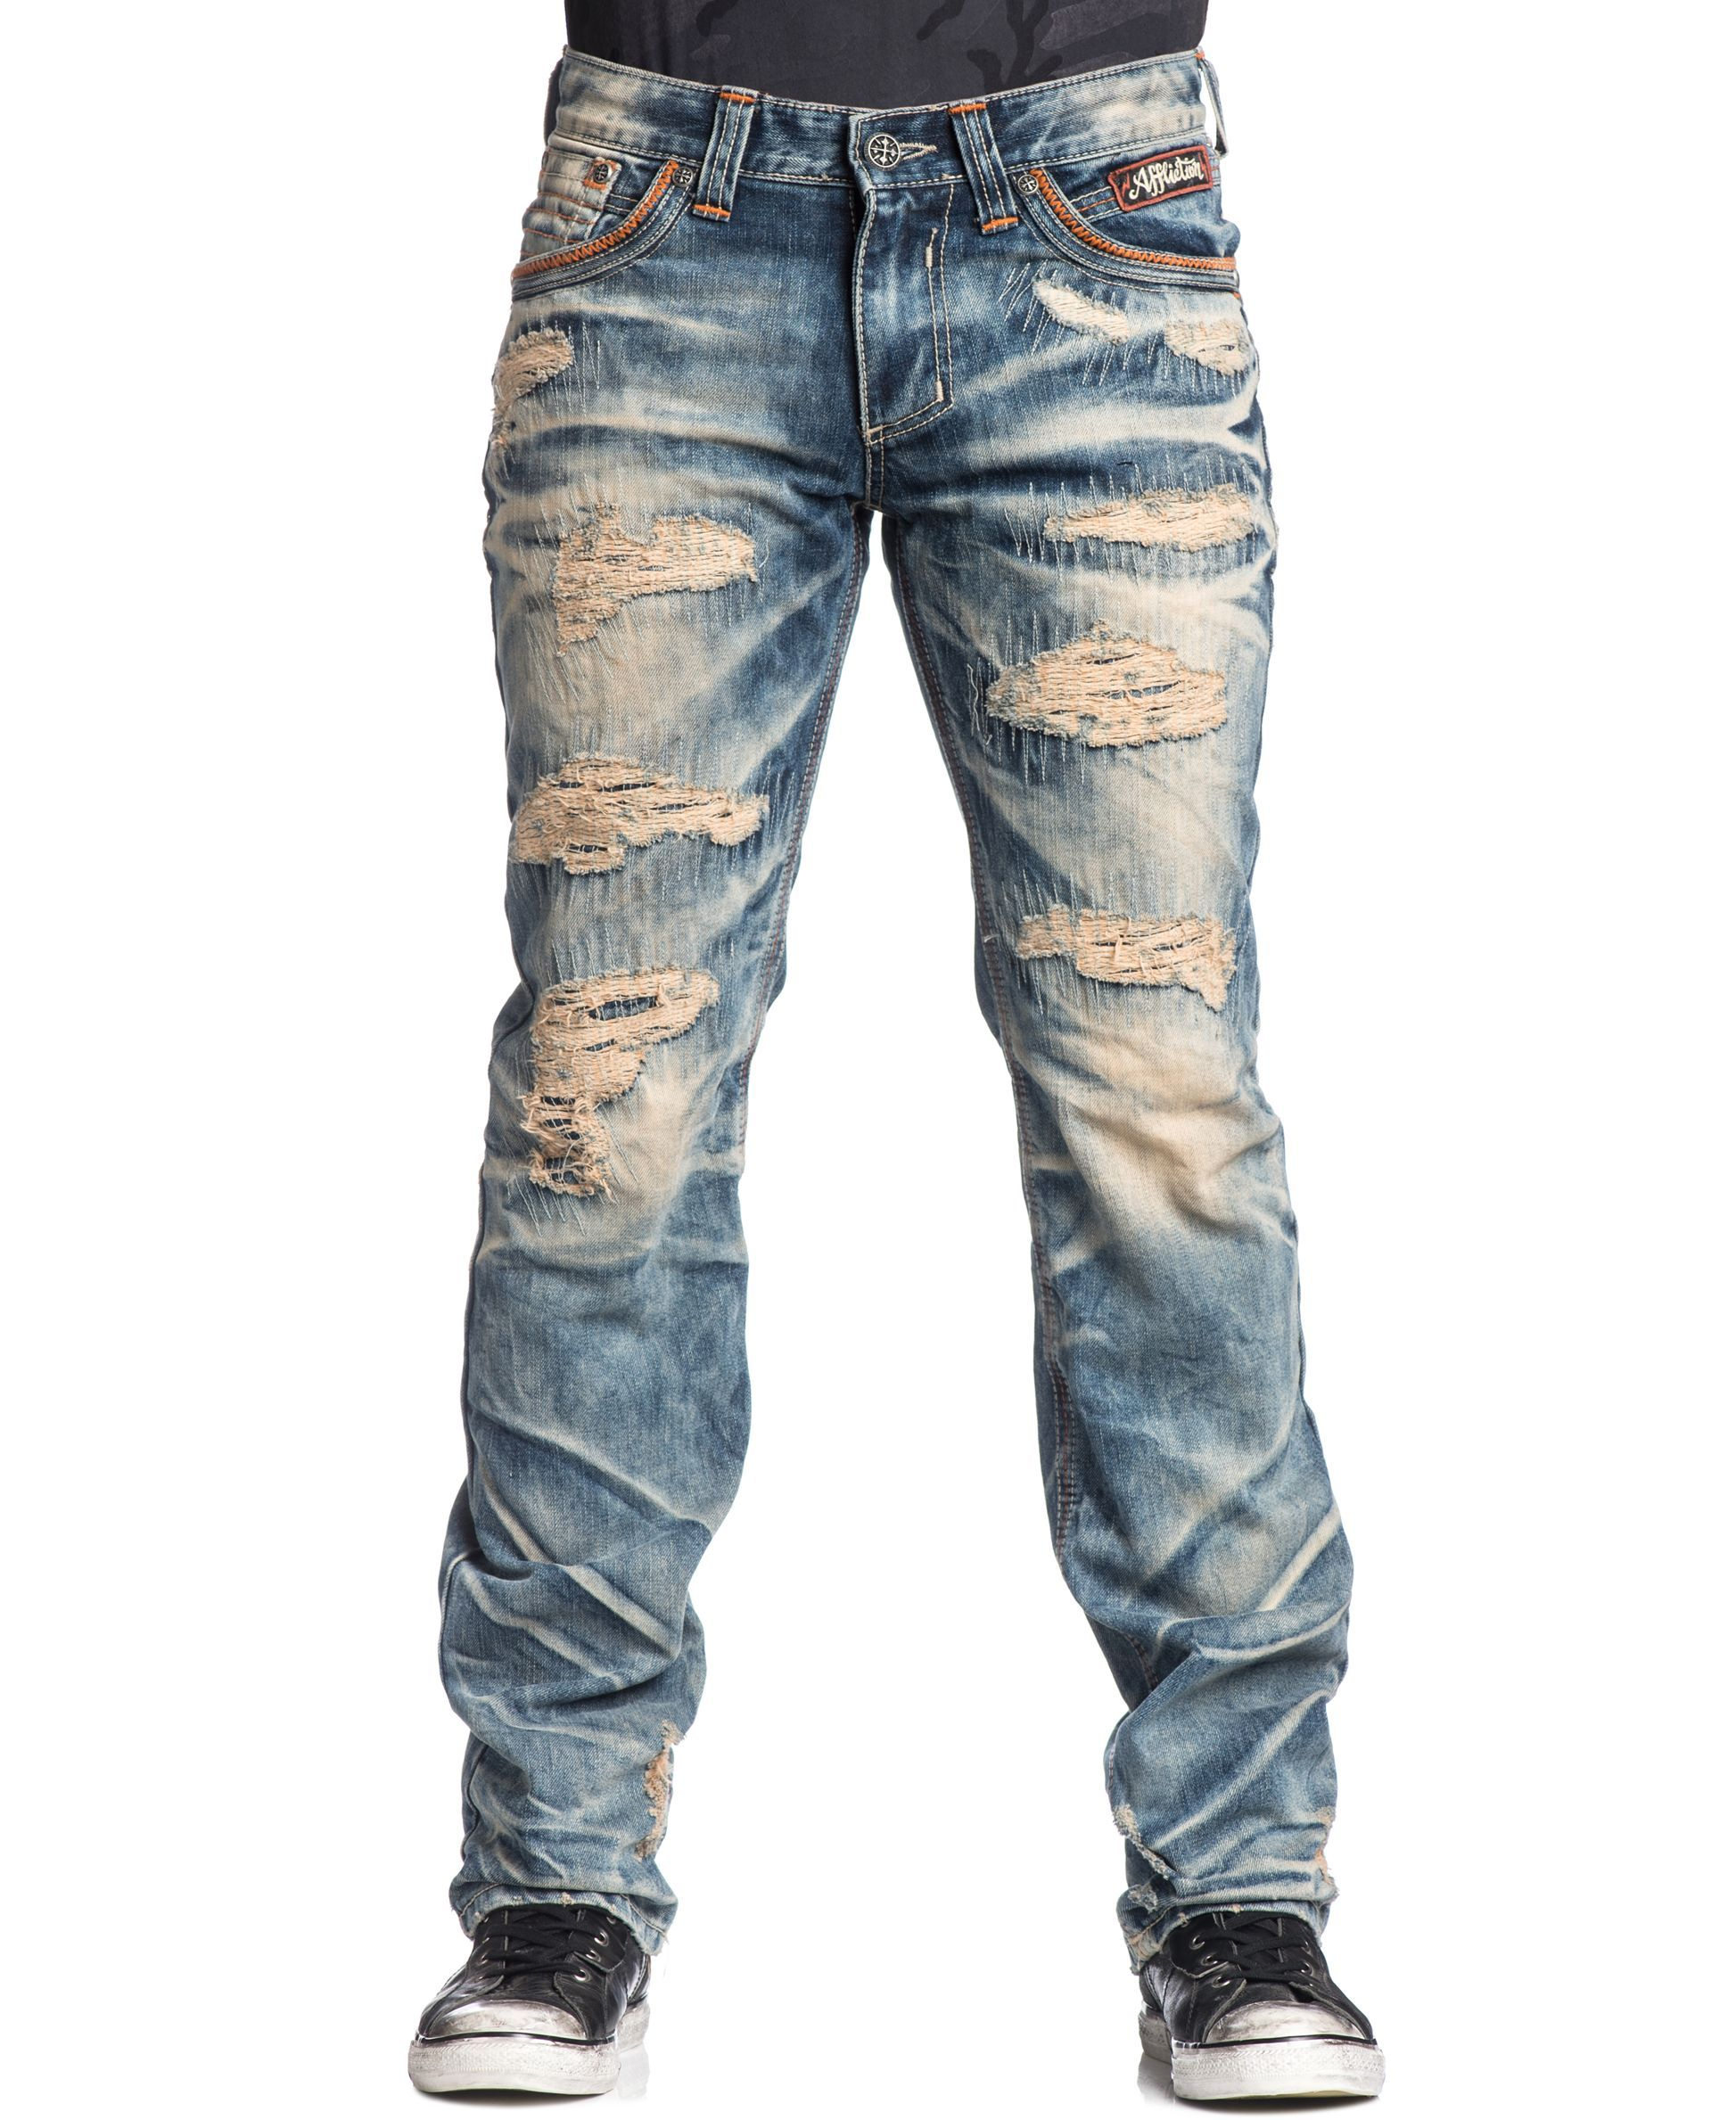 Mens jeans design legends jeans - Affliction Men S Ace Fallen Straight Fit Trevorton Wash Destroyed Jeans